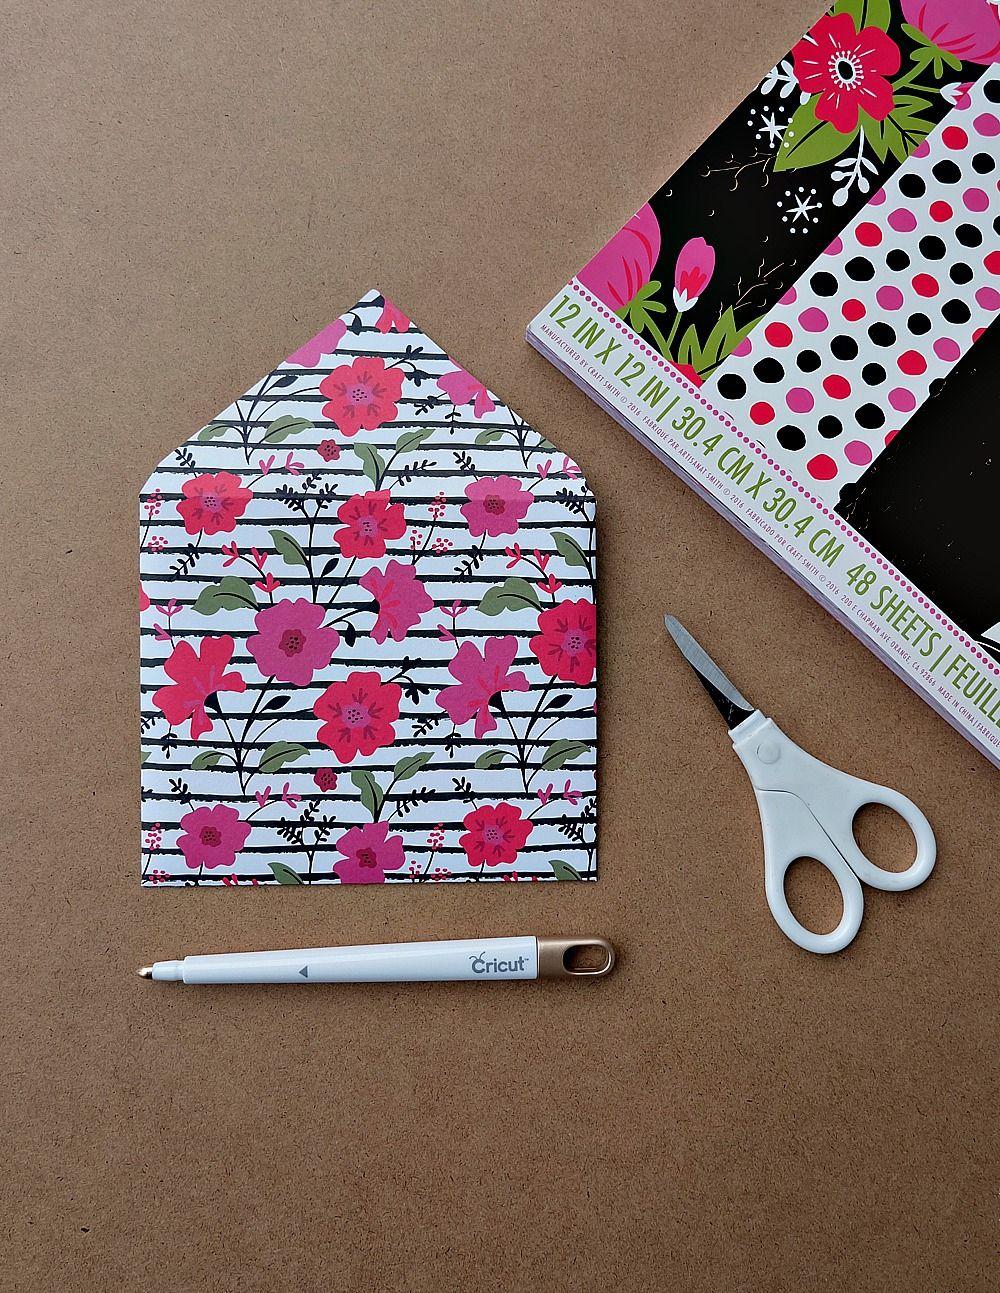 How To Make Diy Envelopes Tutorial - Hello Creative Family ...